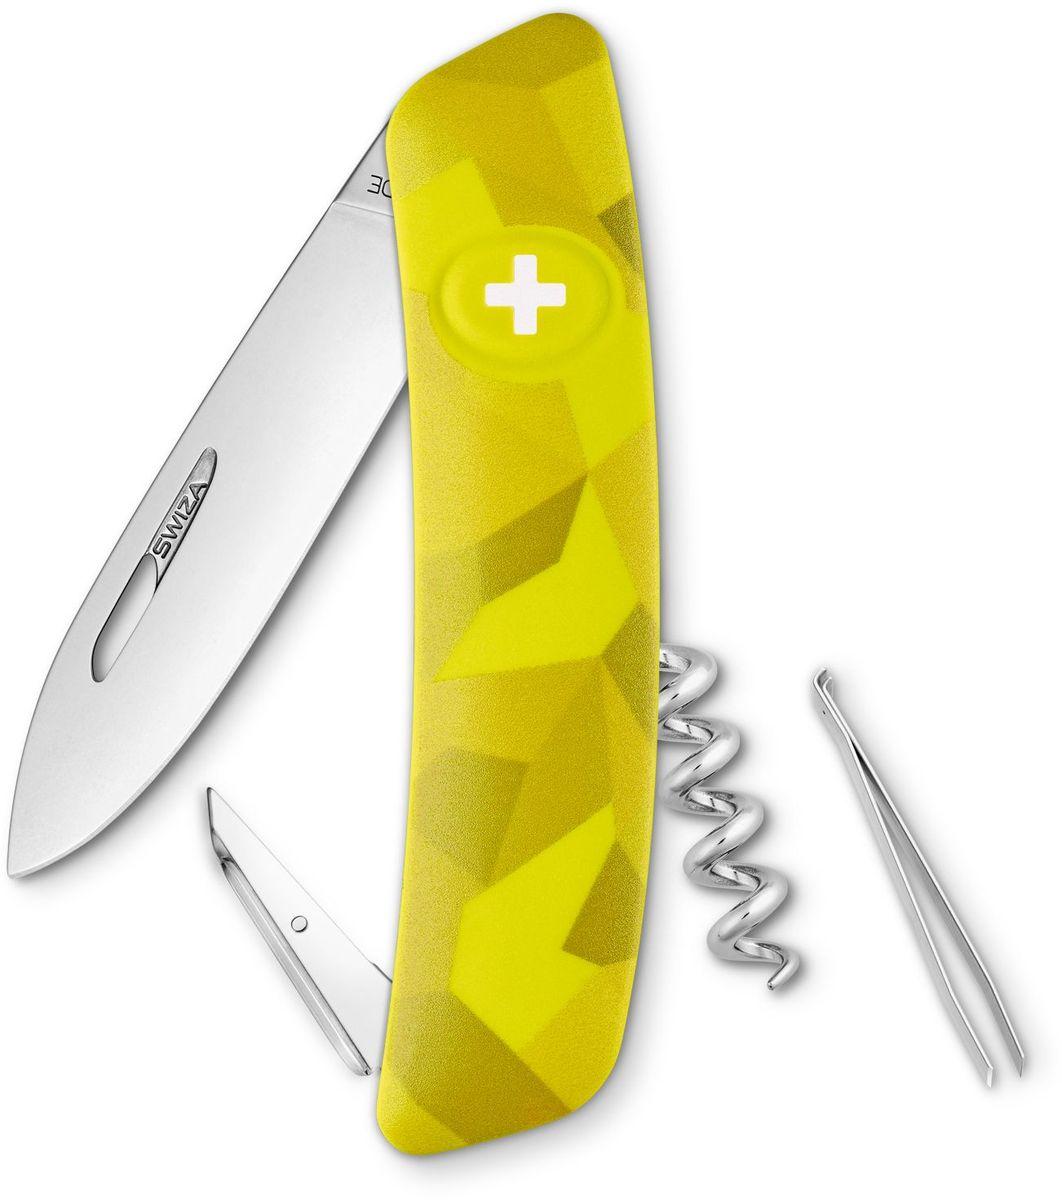 Нож швейцарский SWIZA C01, цвет: желтый, длина клинка 7,5 см